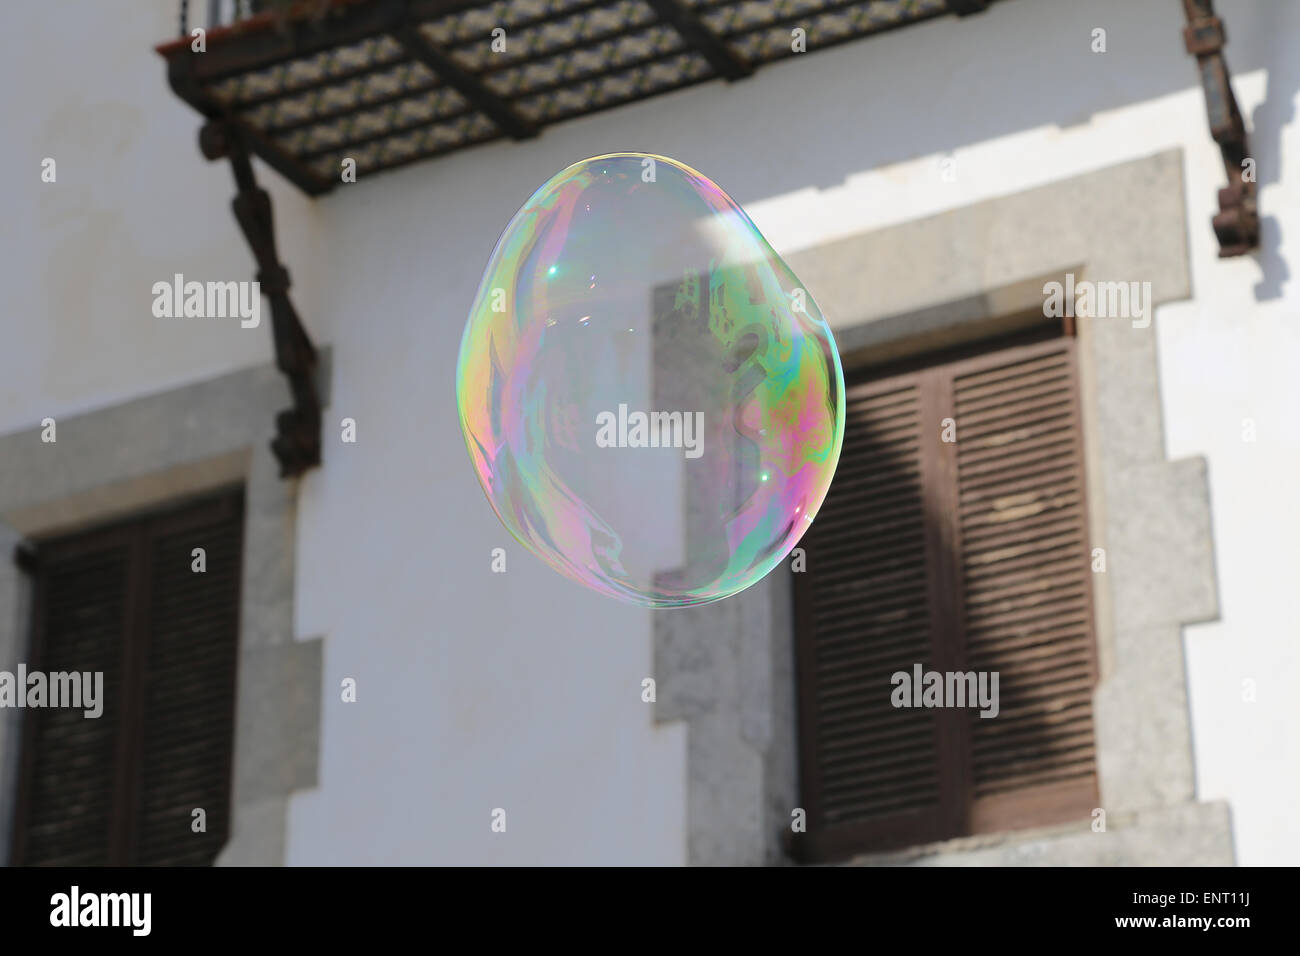 Soap bubble. - Stock Image